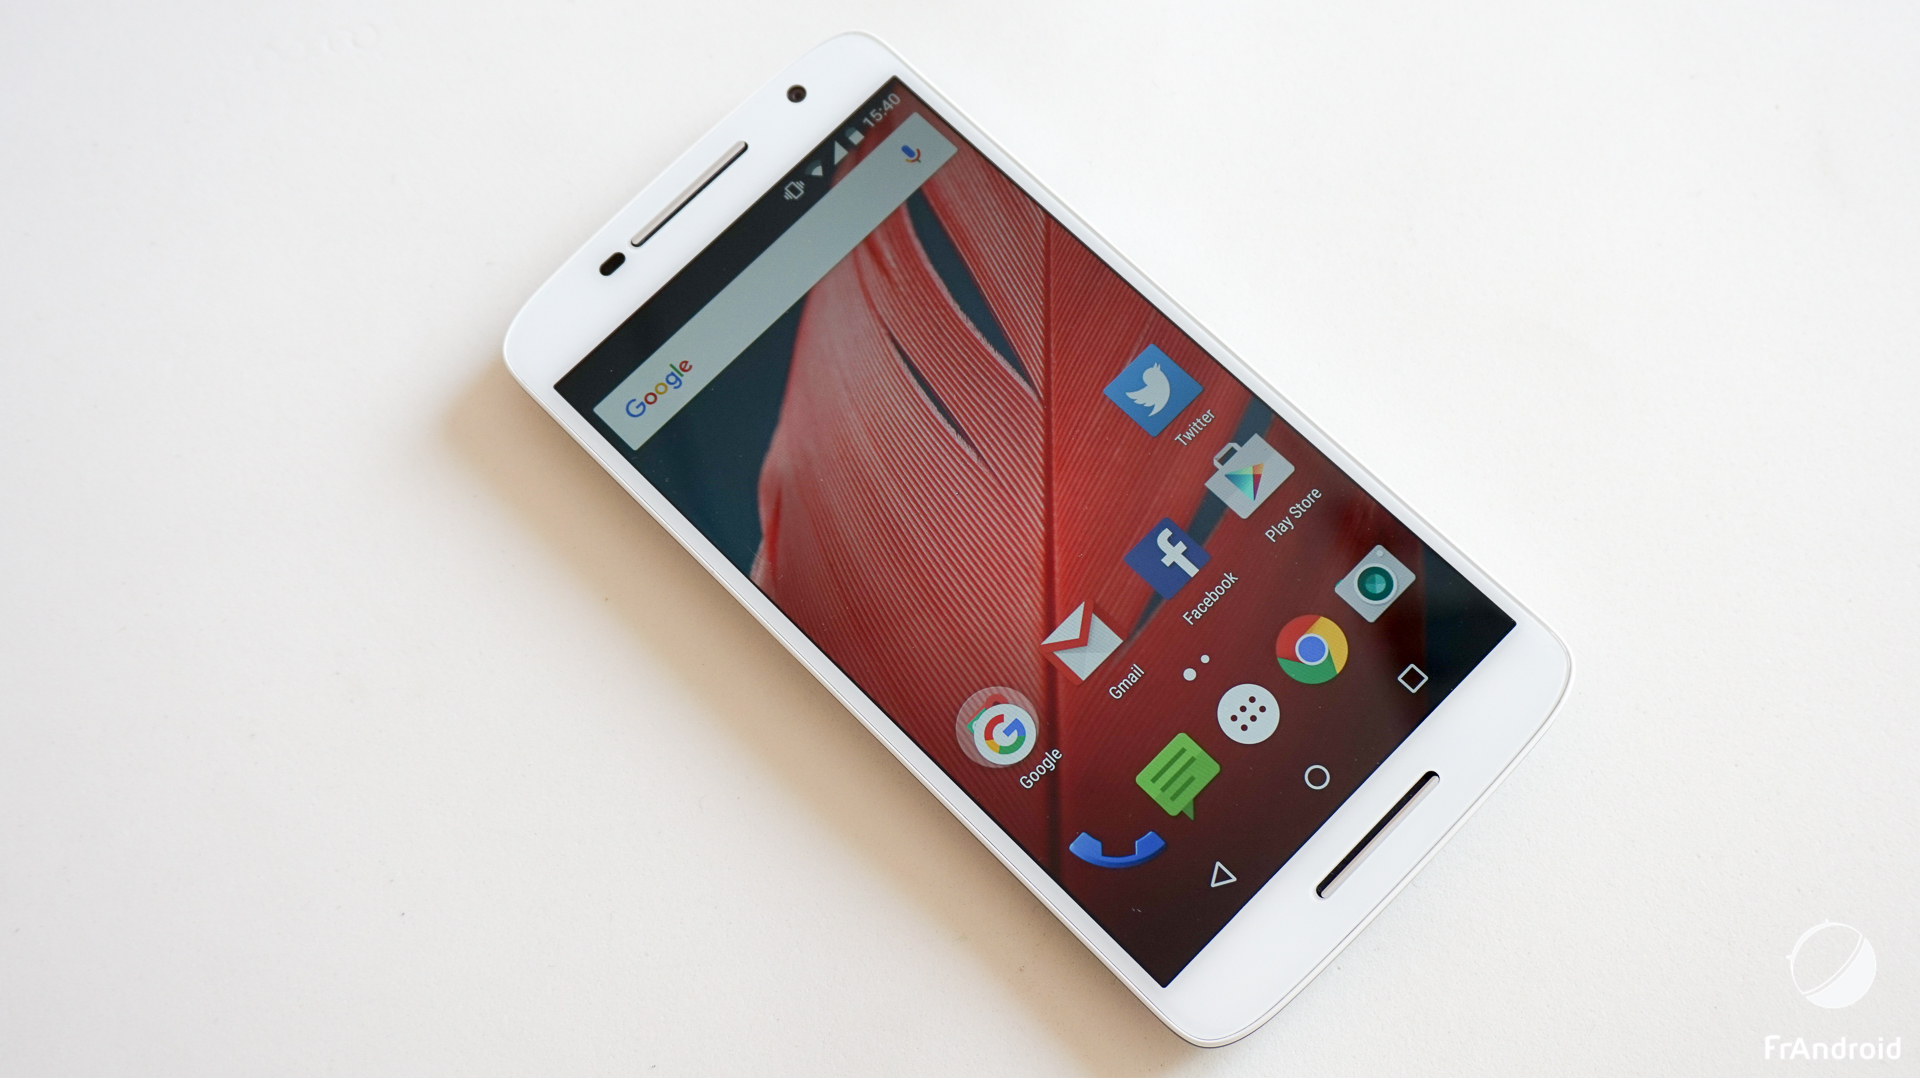 Motorola Moto X Play (13 sur 21)